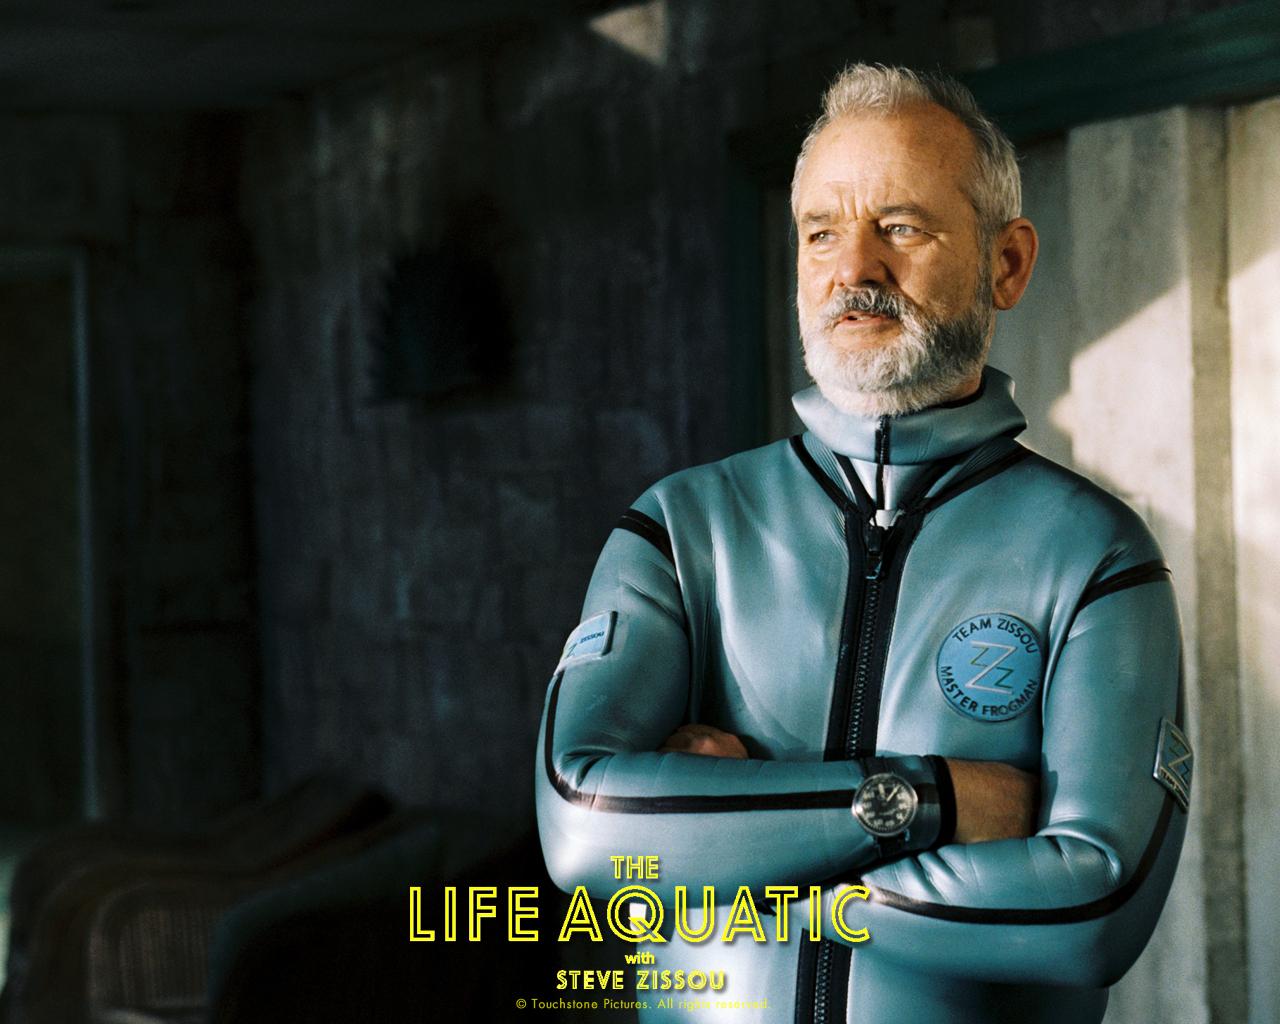 TLA-the-life-aquatic-with-steve-zissou-10175140-1280-1024.jpg